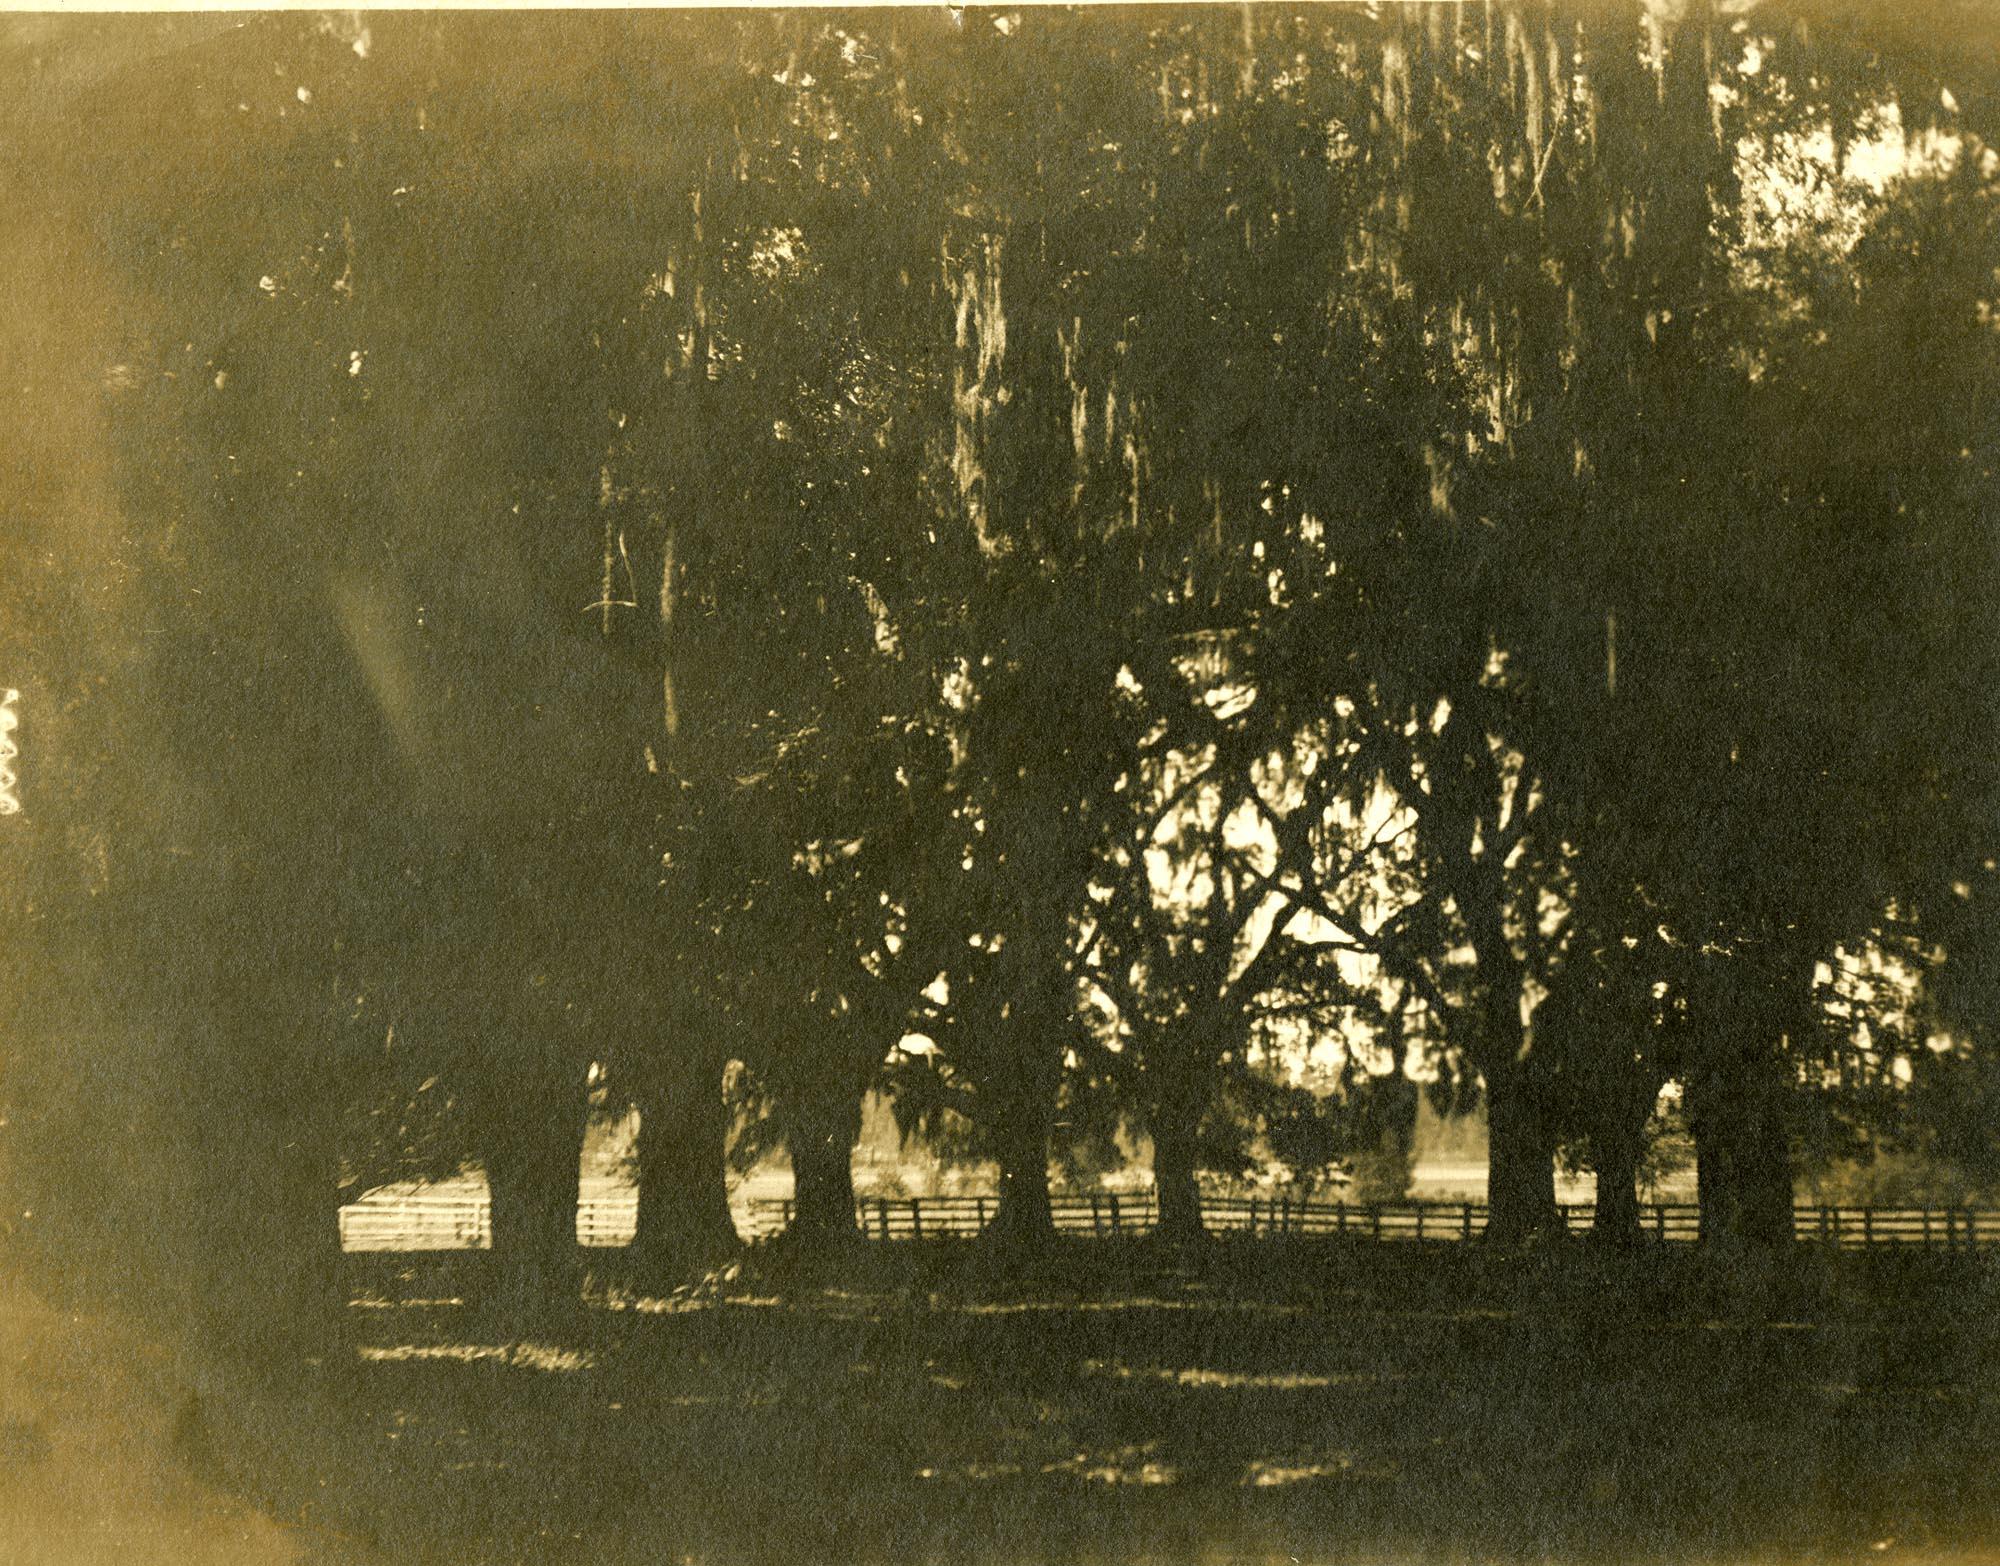 Plantations, Tomotley Plantation